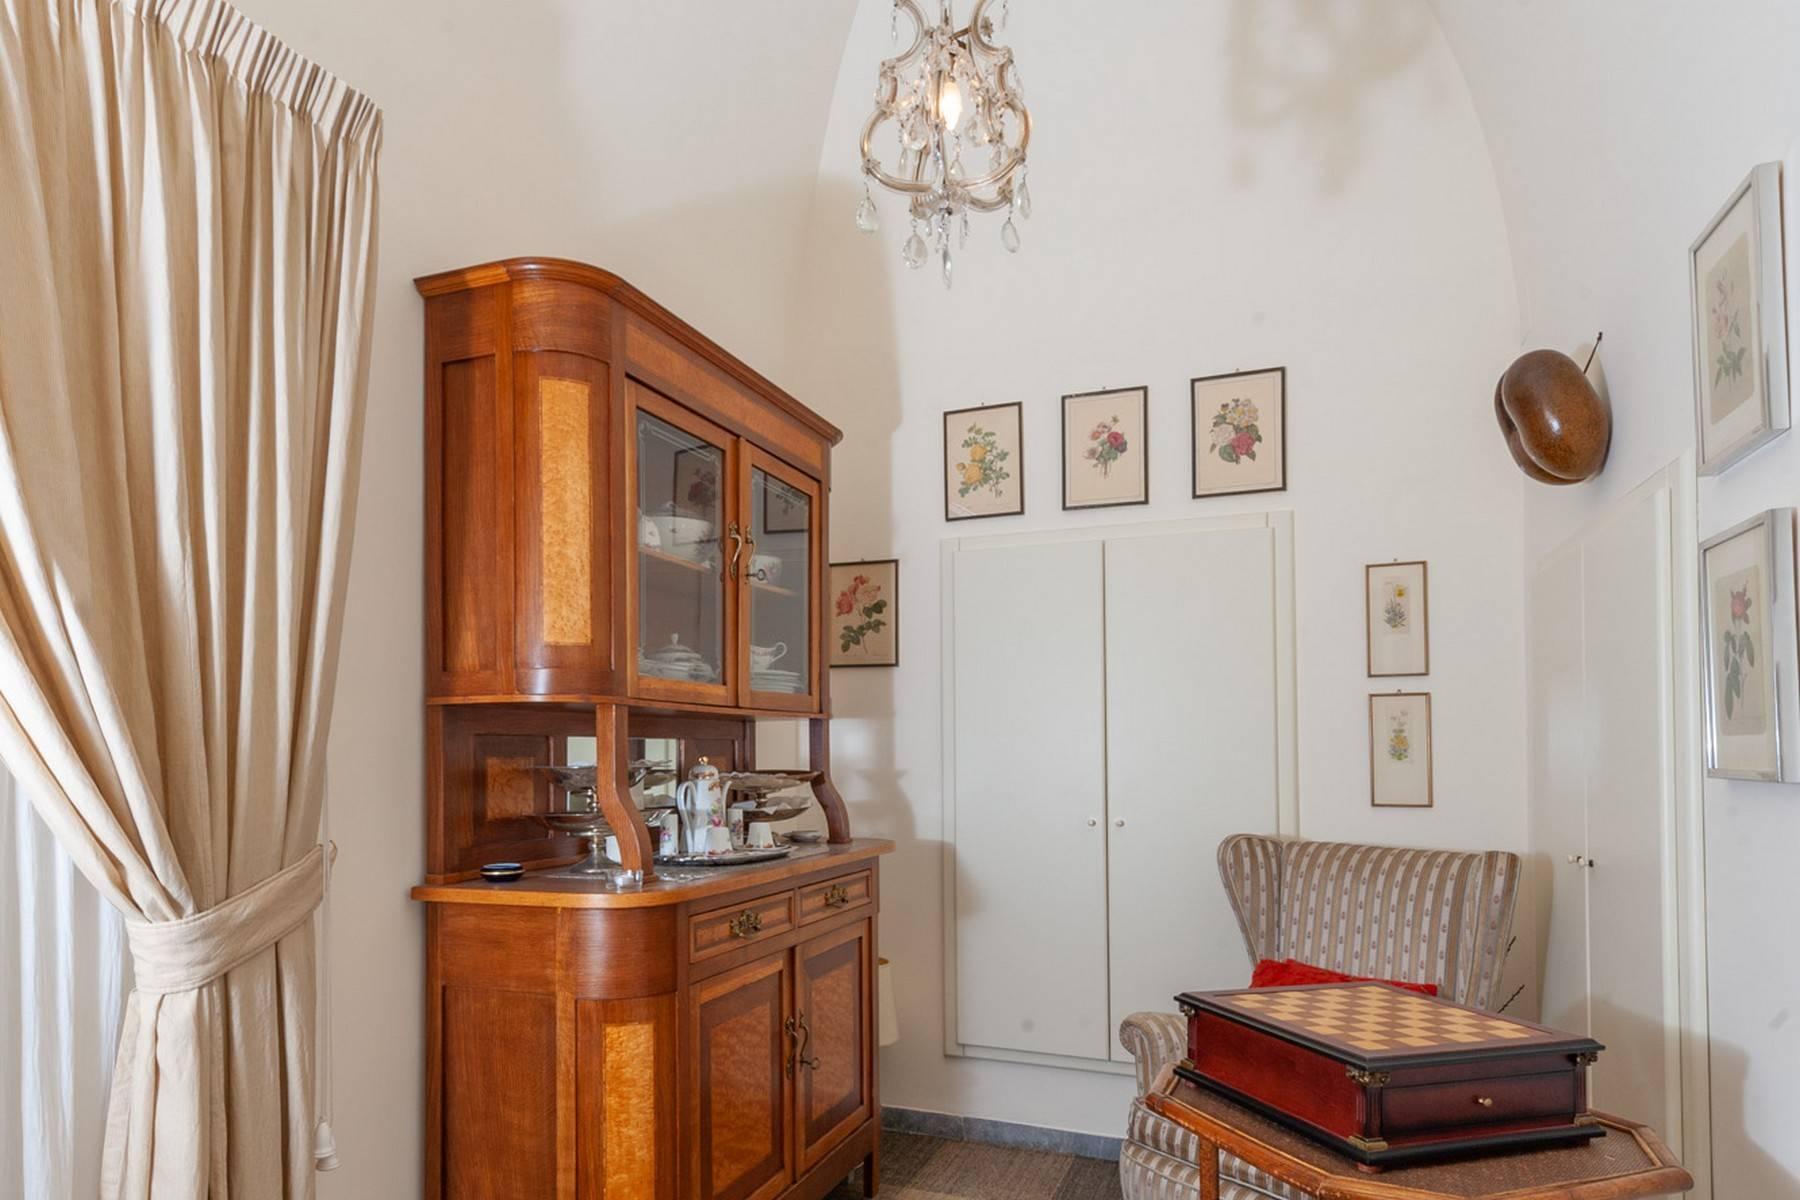 Splendida villa gentilizia del '600 circondata da agrumeti - 34